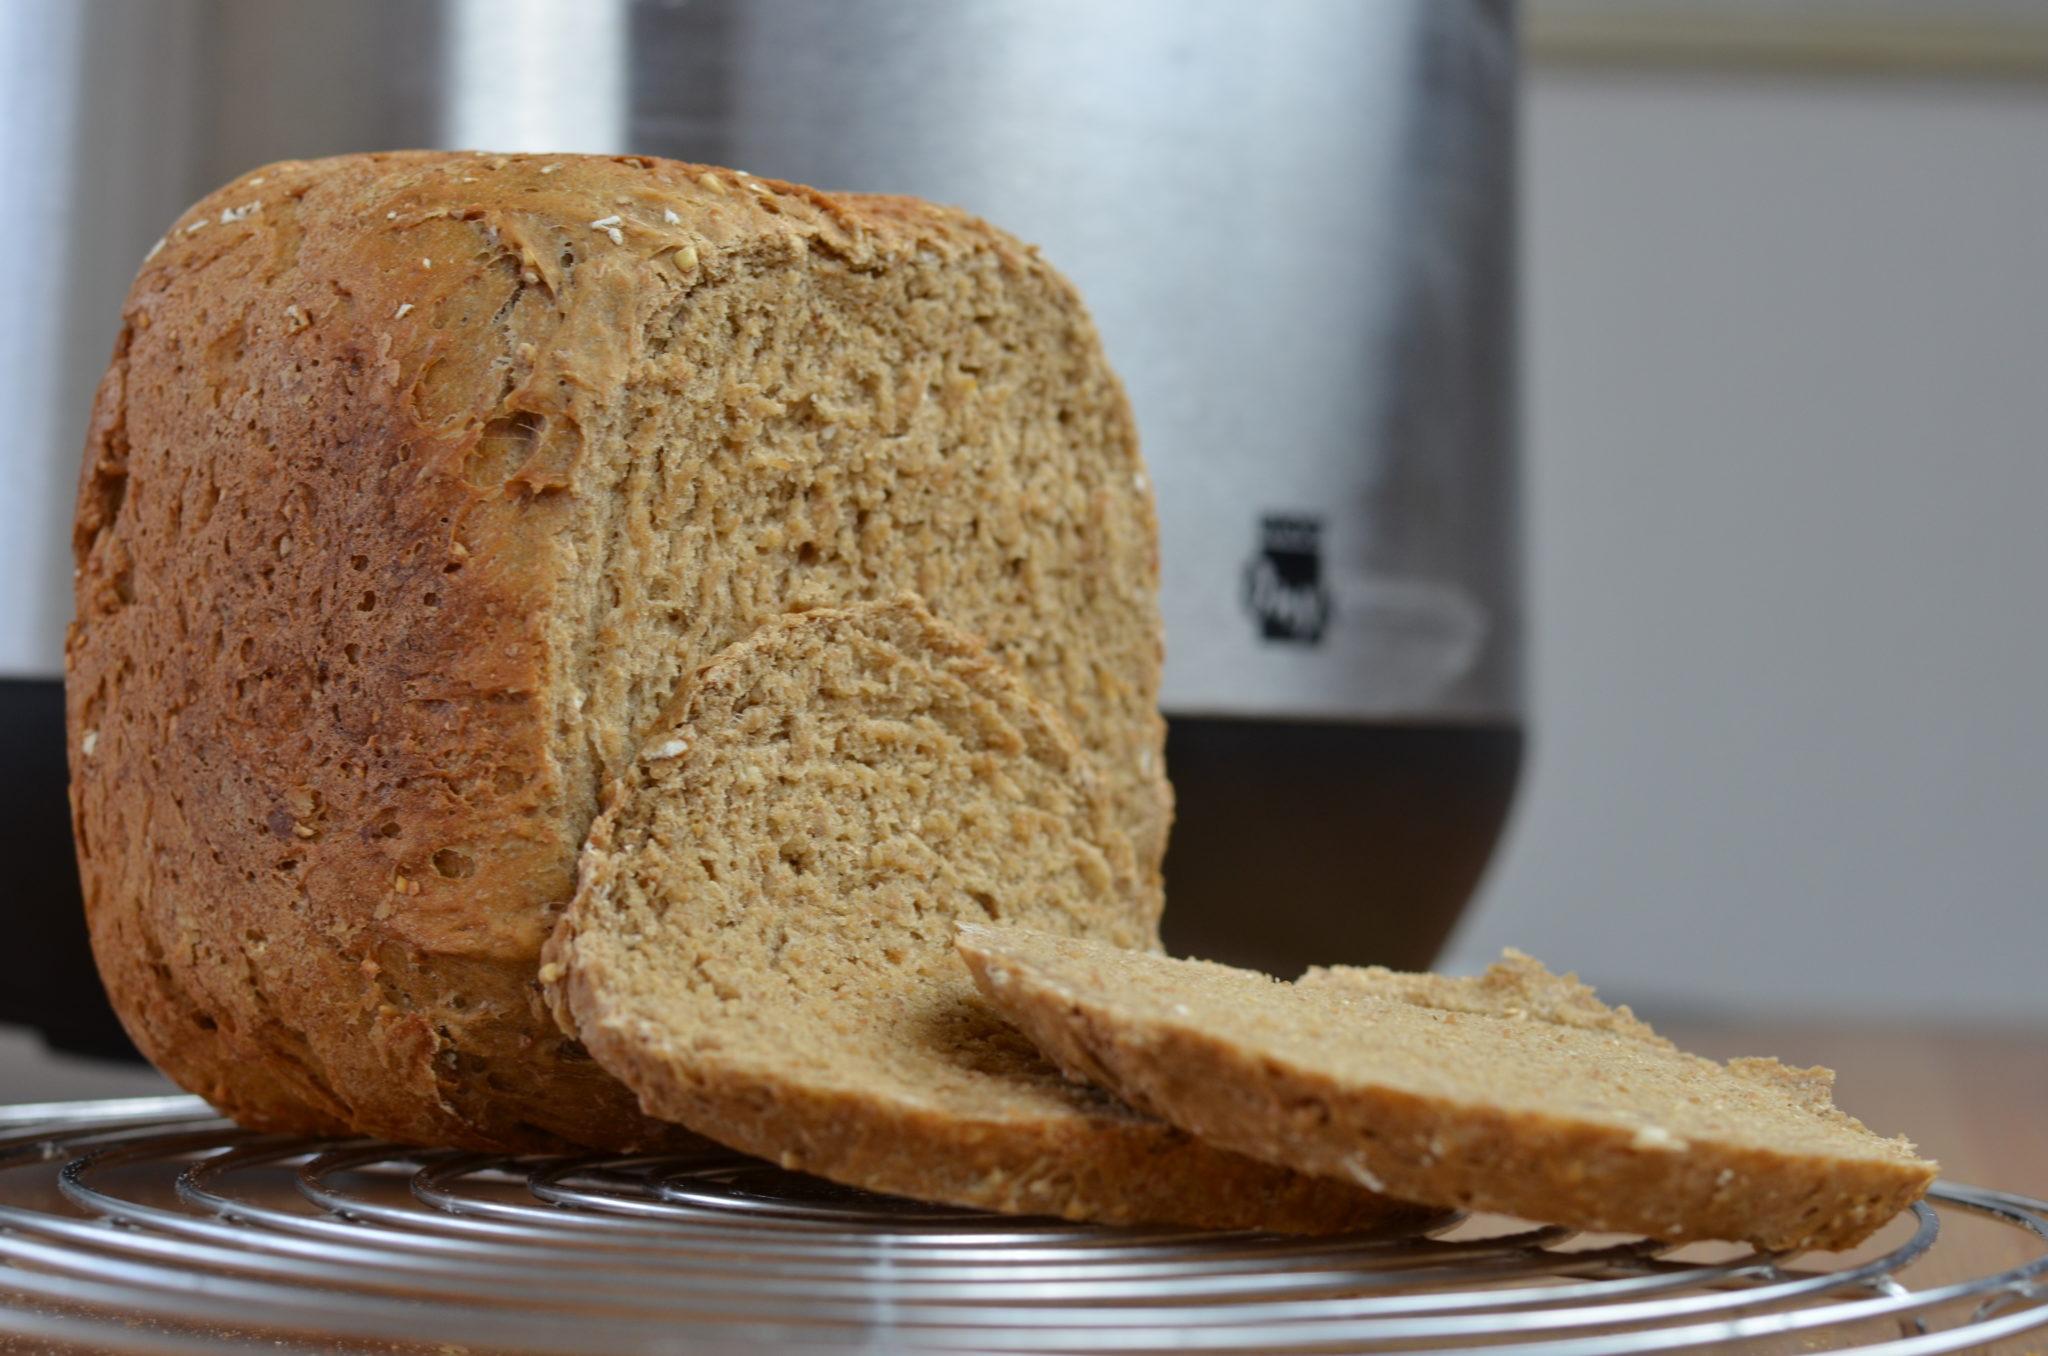 Vollkornbarot aus dem Unold Brotbackautomat